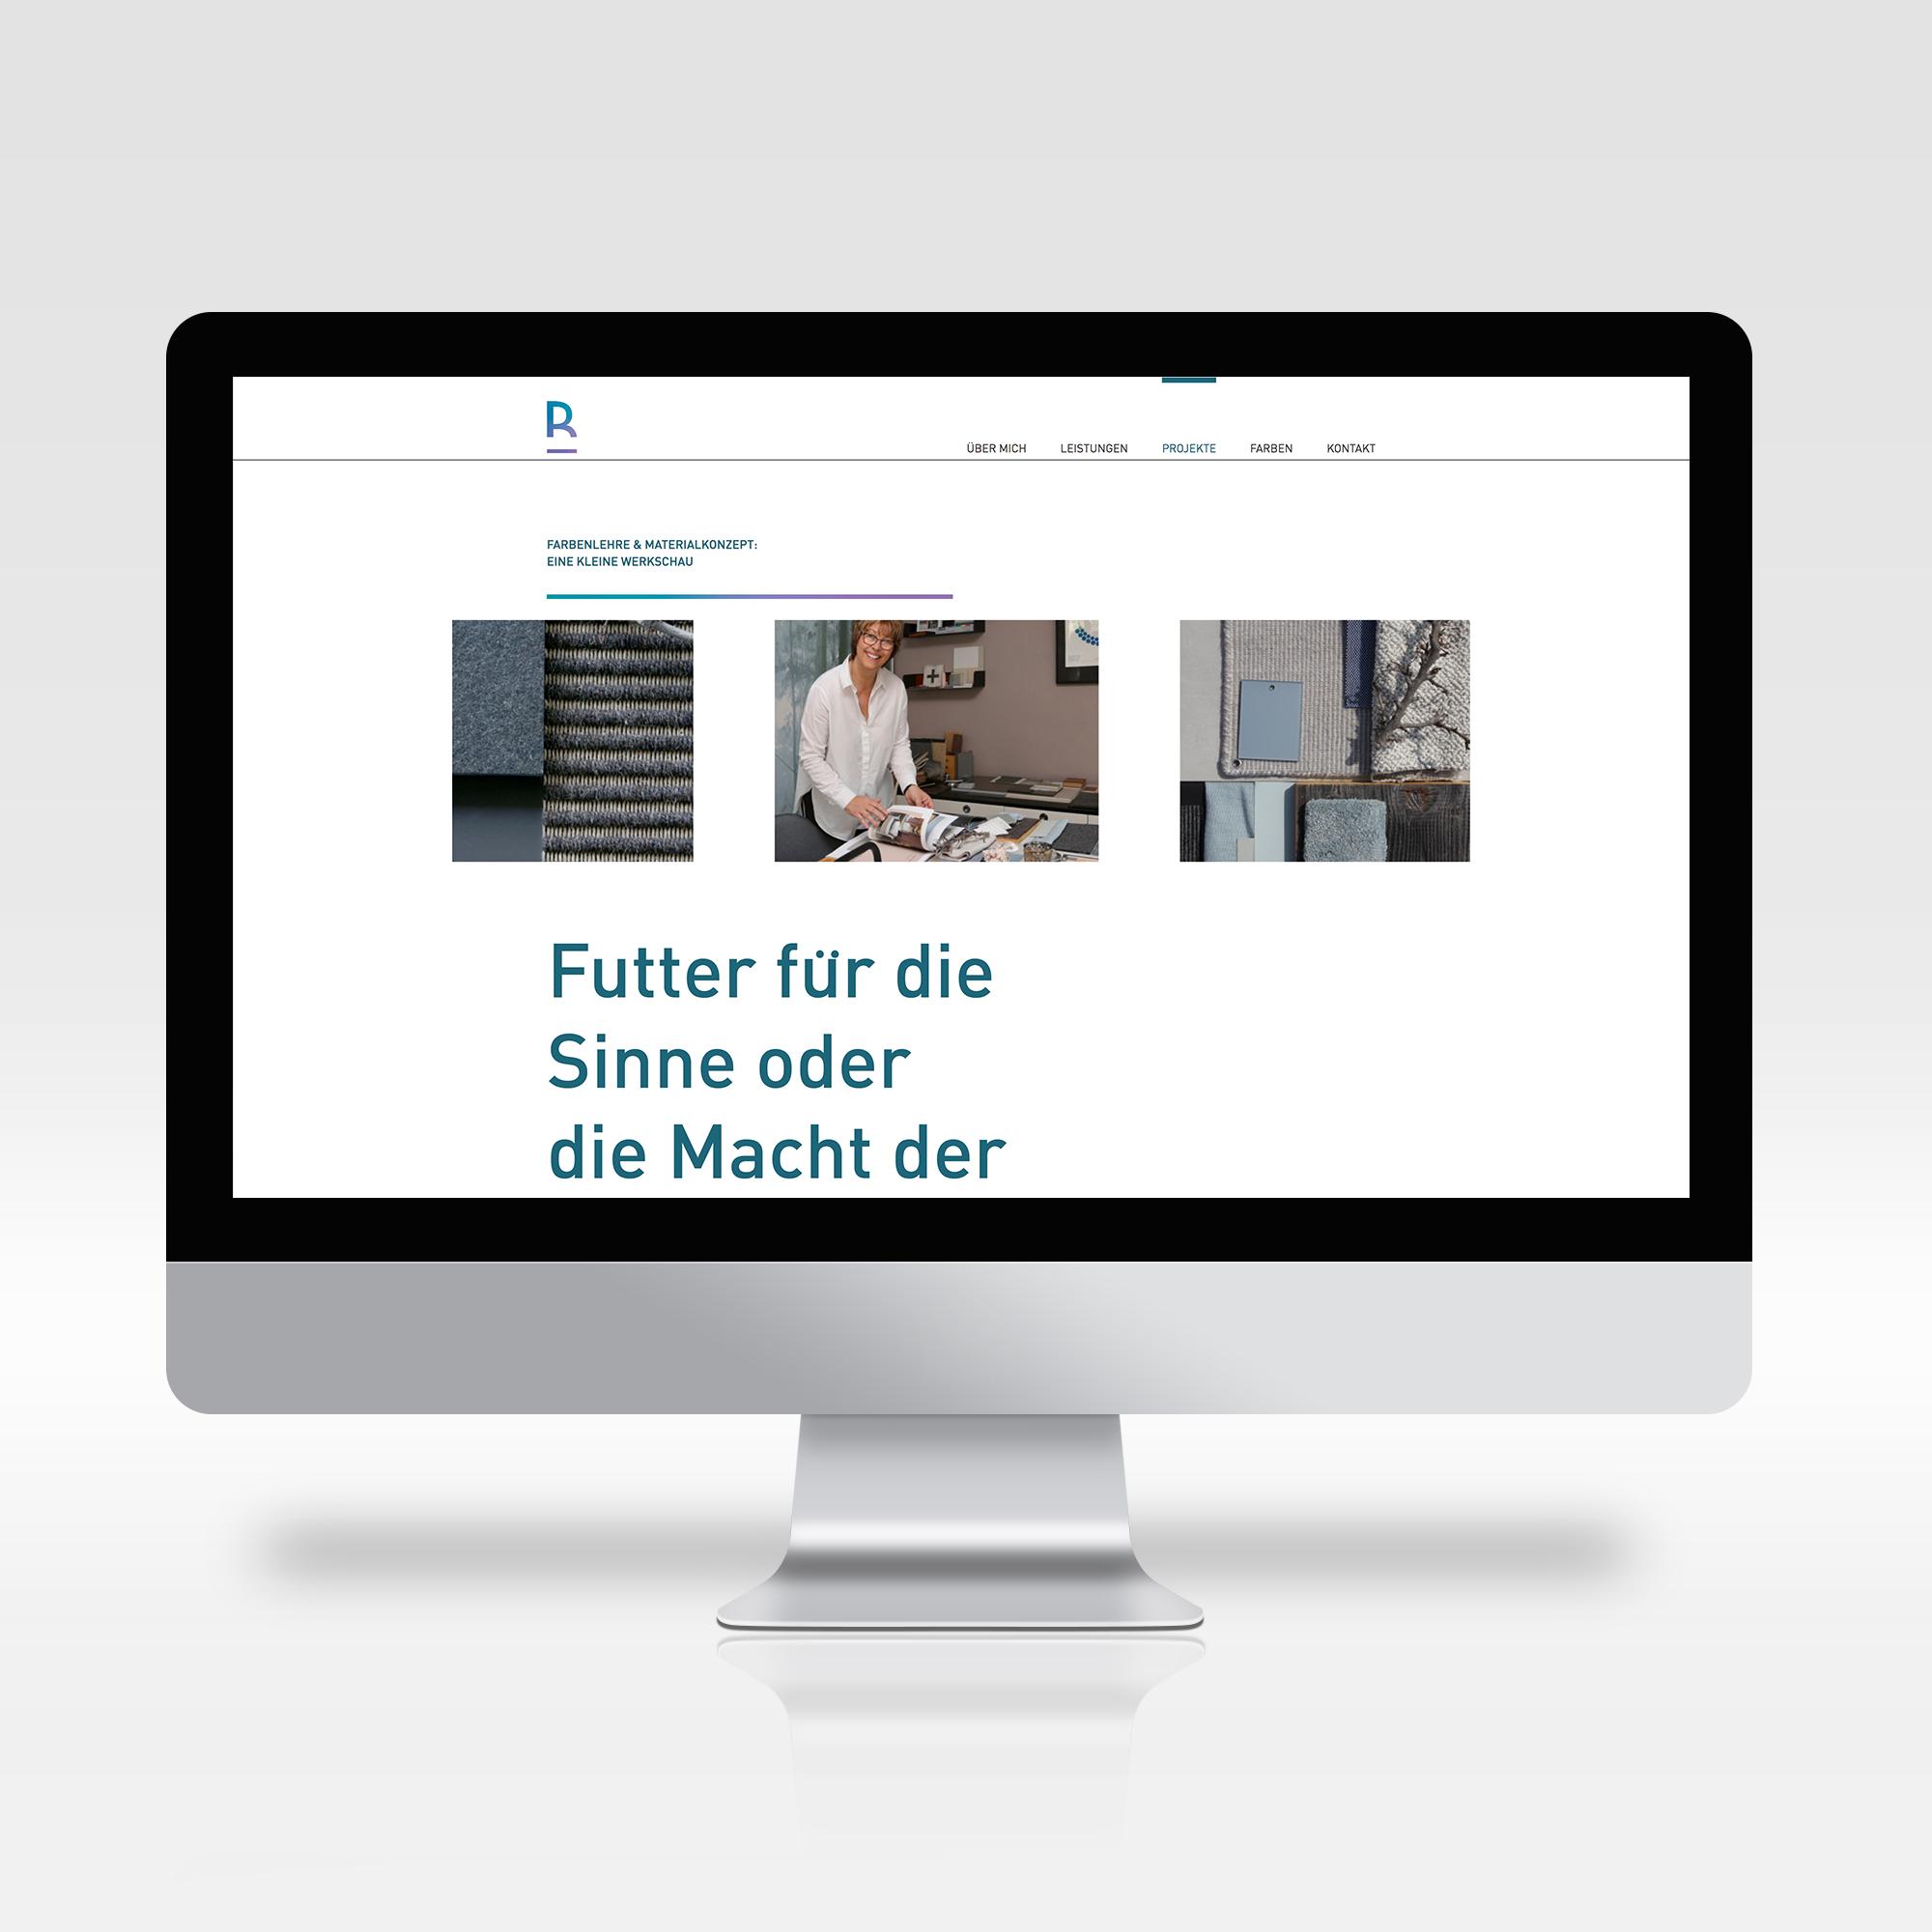 Bröcker_Webseite_g2